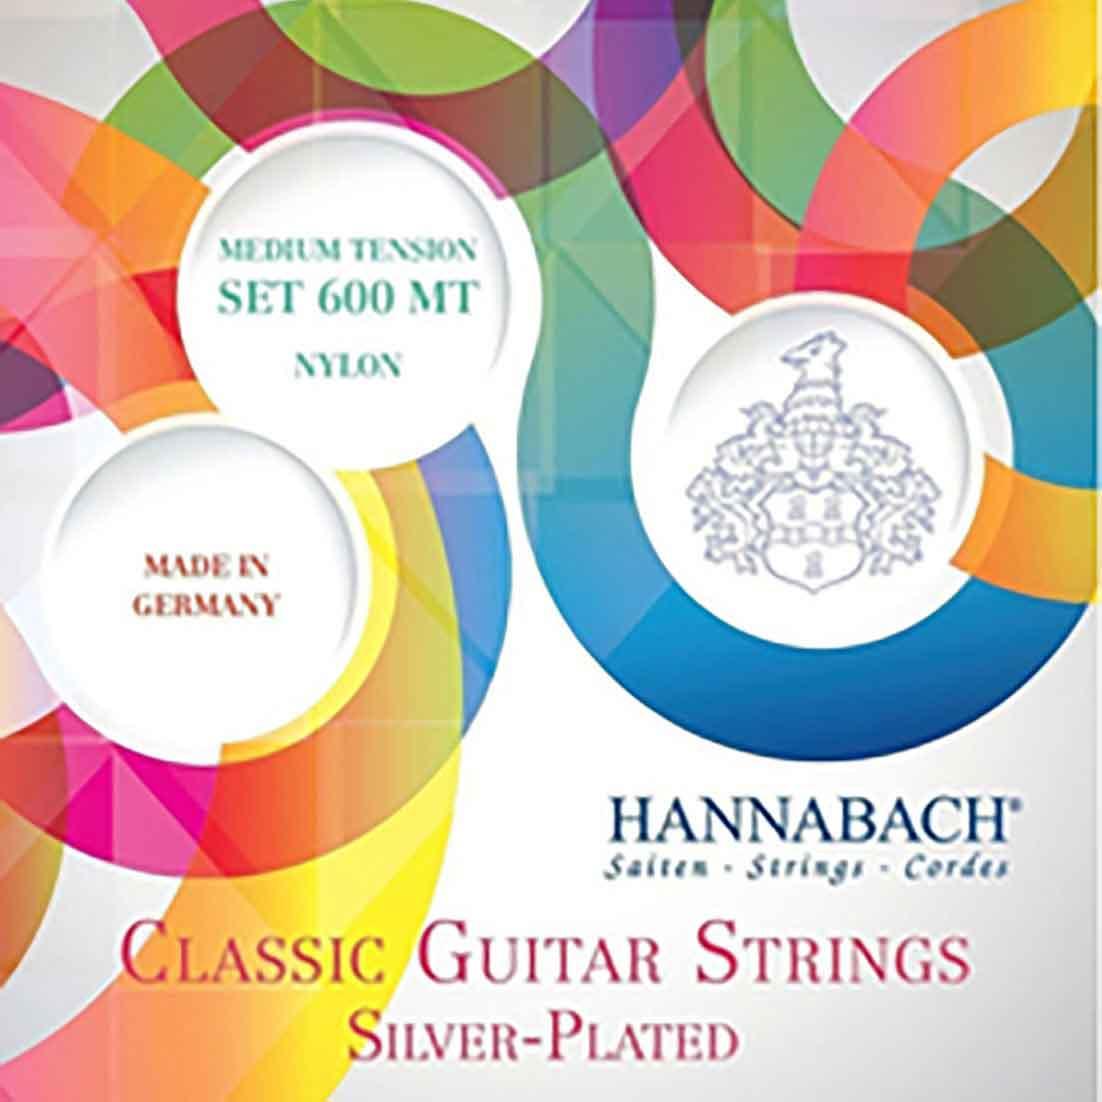 Hannabach-600MT-古典吉他弦-中張力-環保包裝